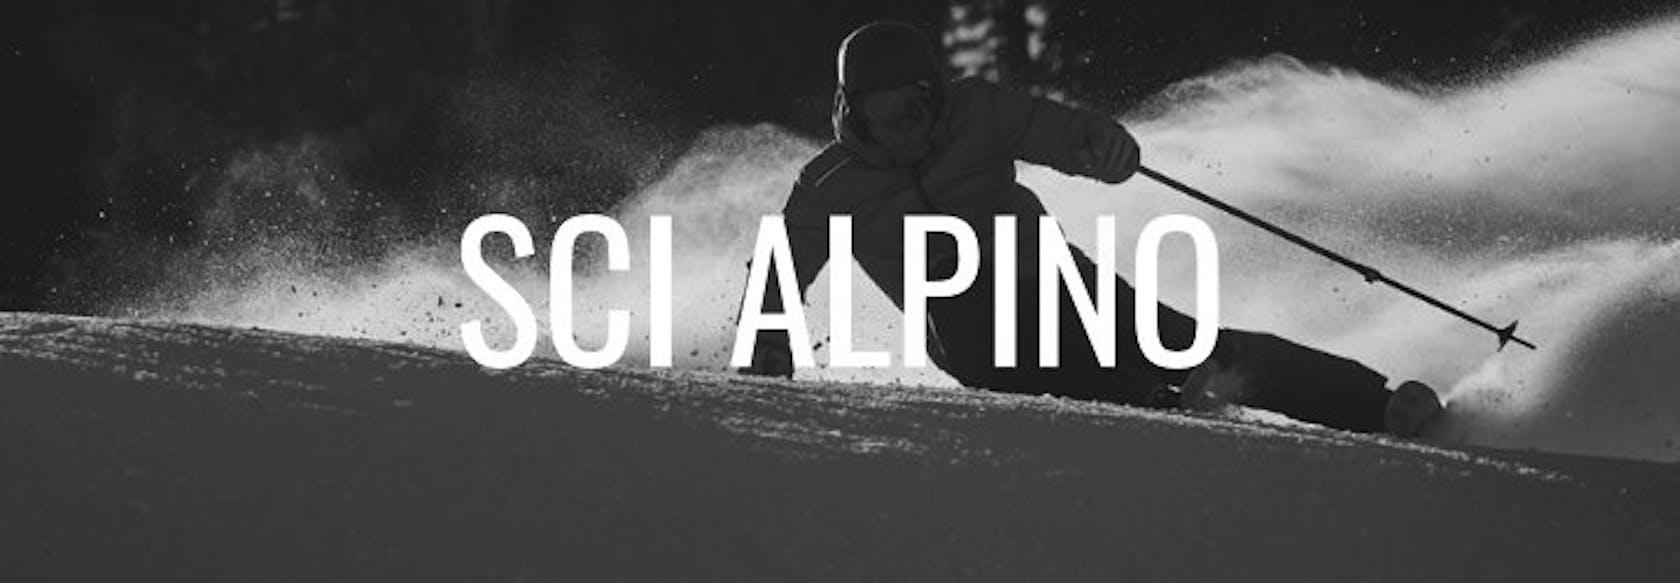 Shop online sci alpino